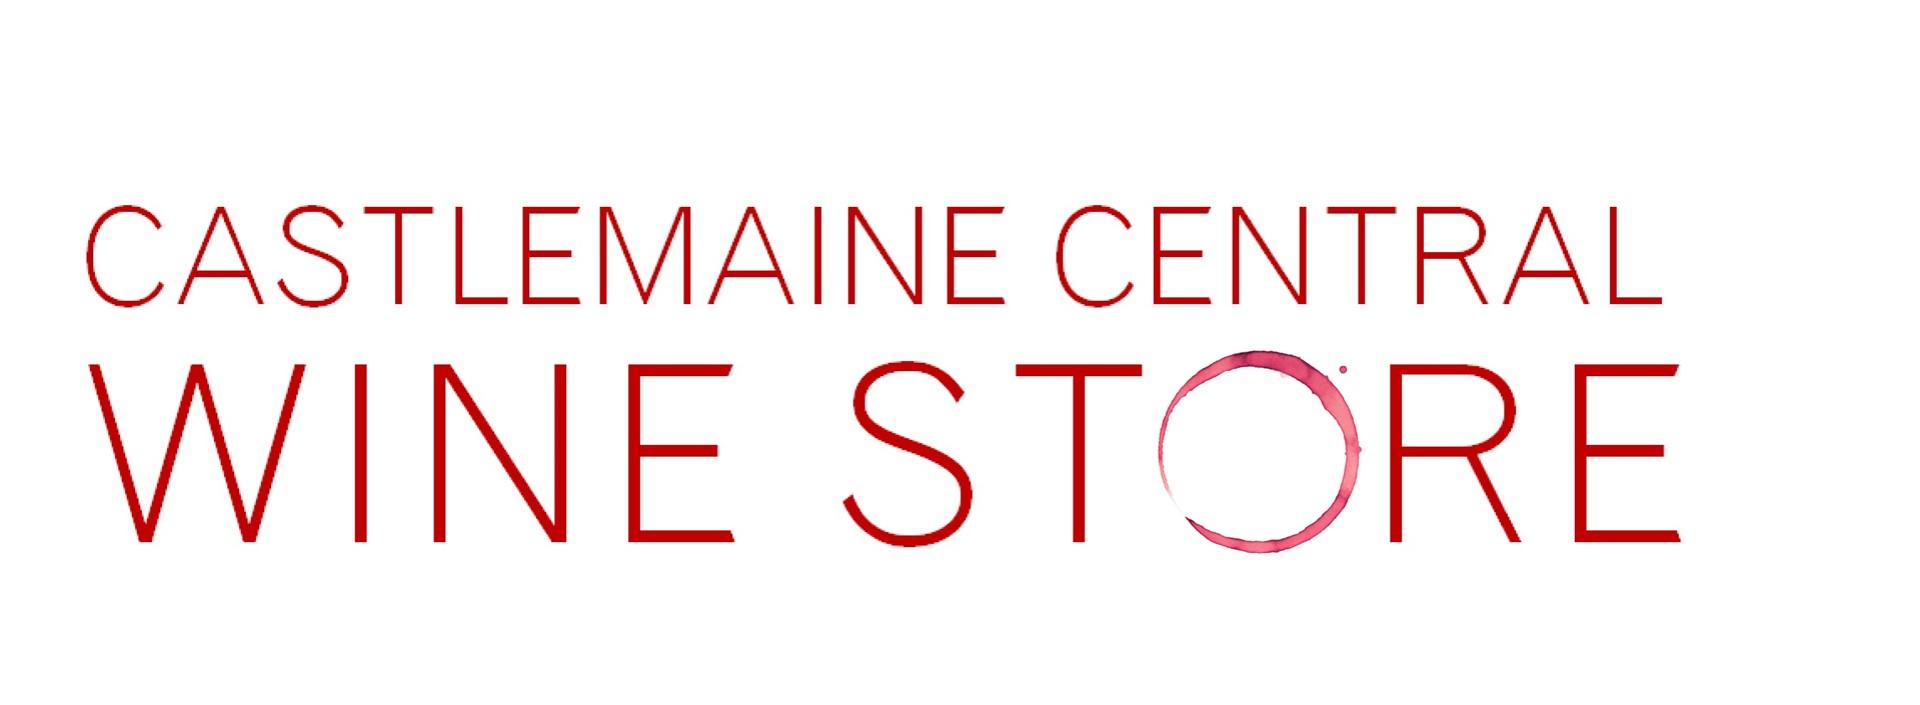 Castlemaine Wine Store logo